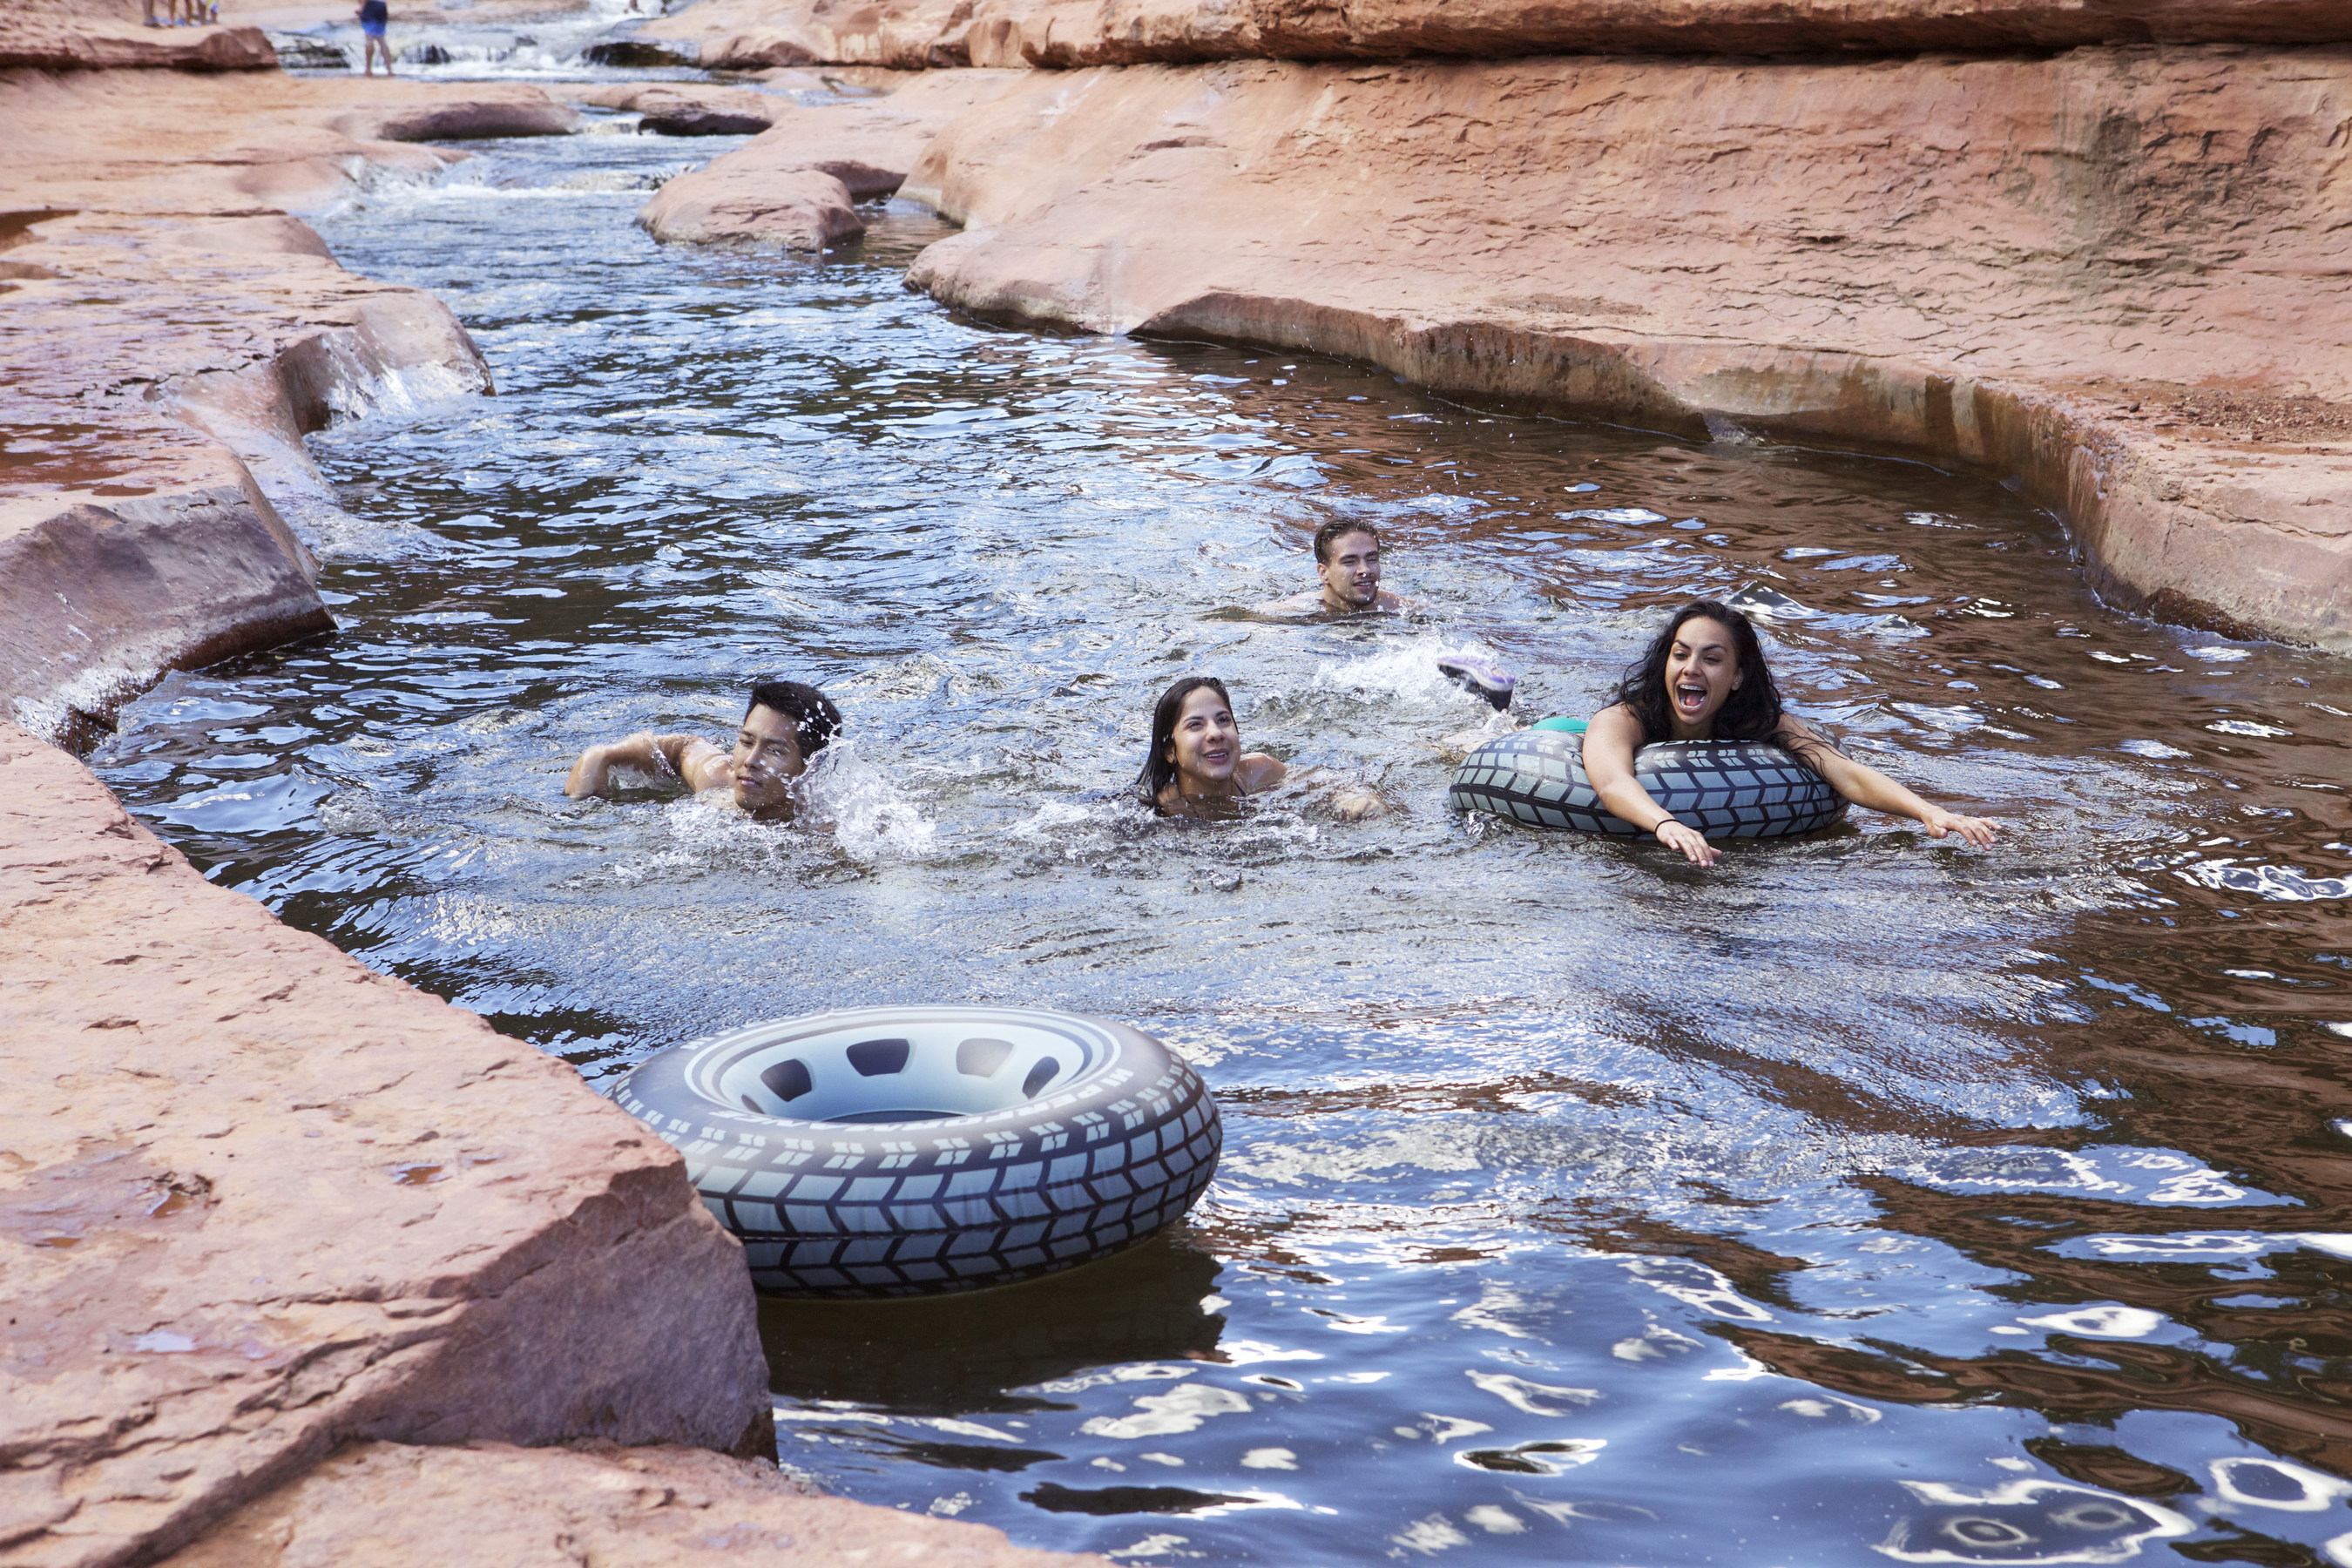 SlideRock AZ - Swimmers float along Arizona's Slide